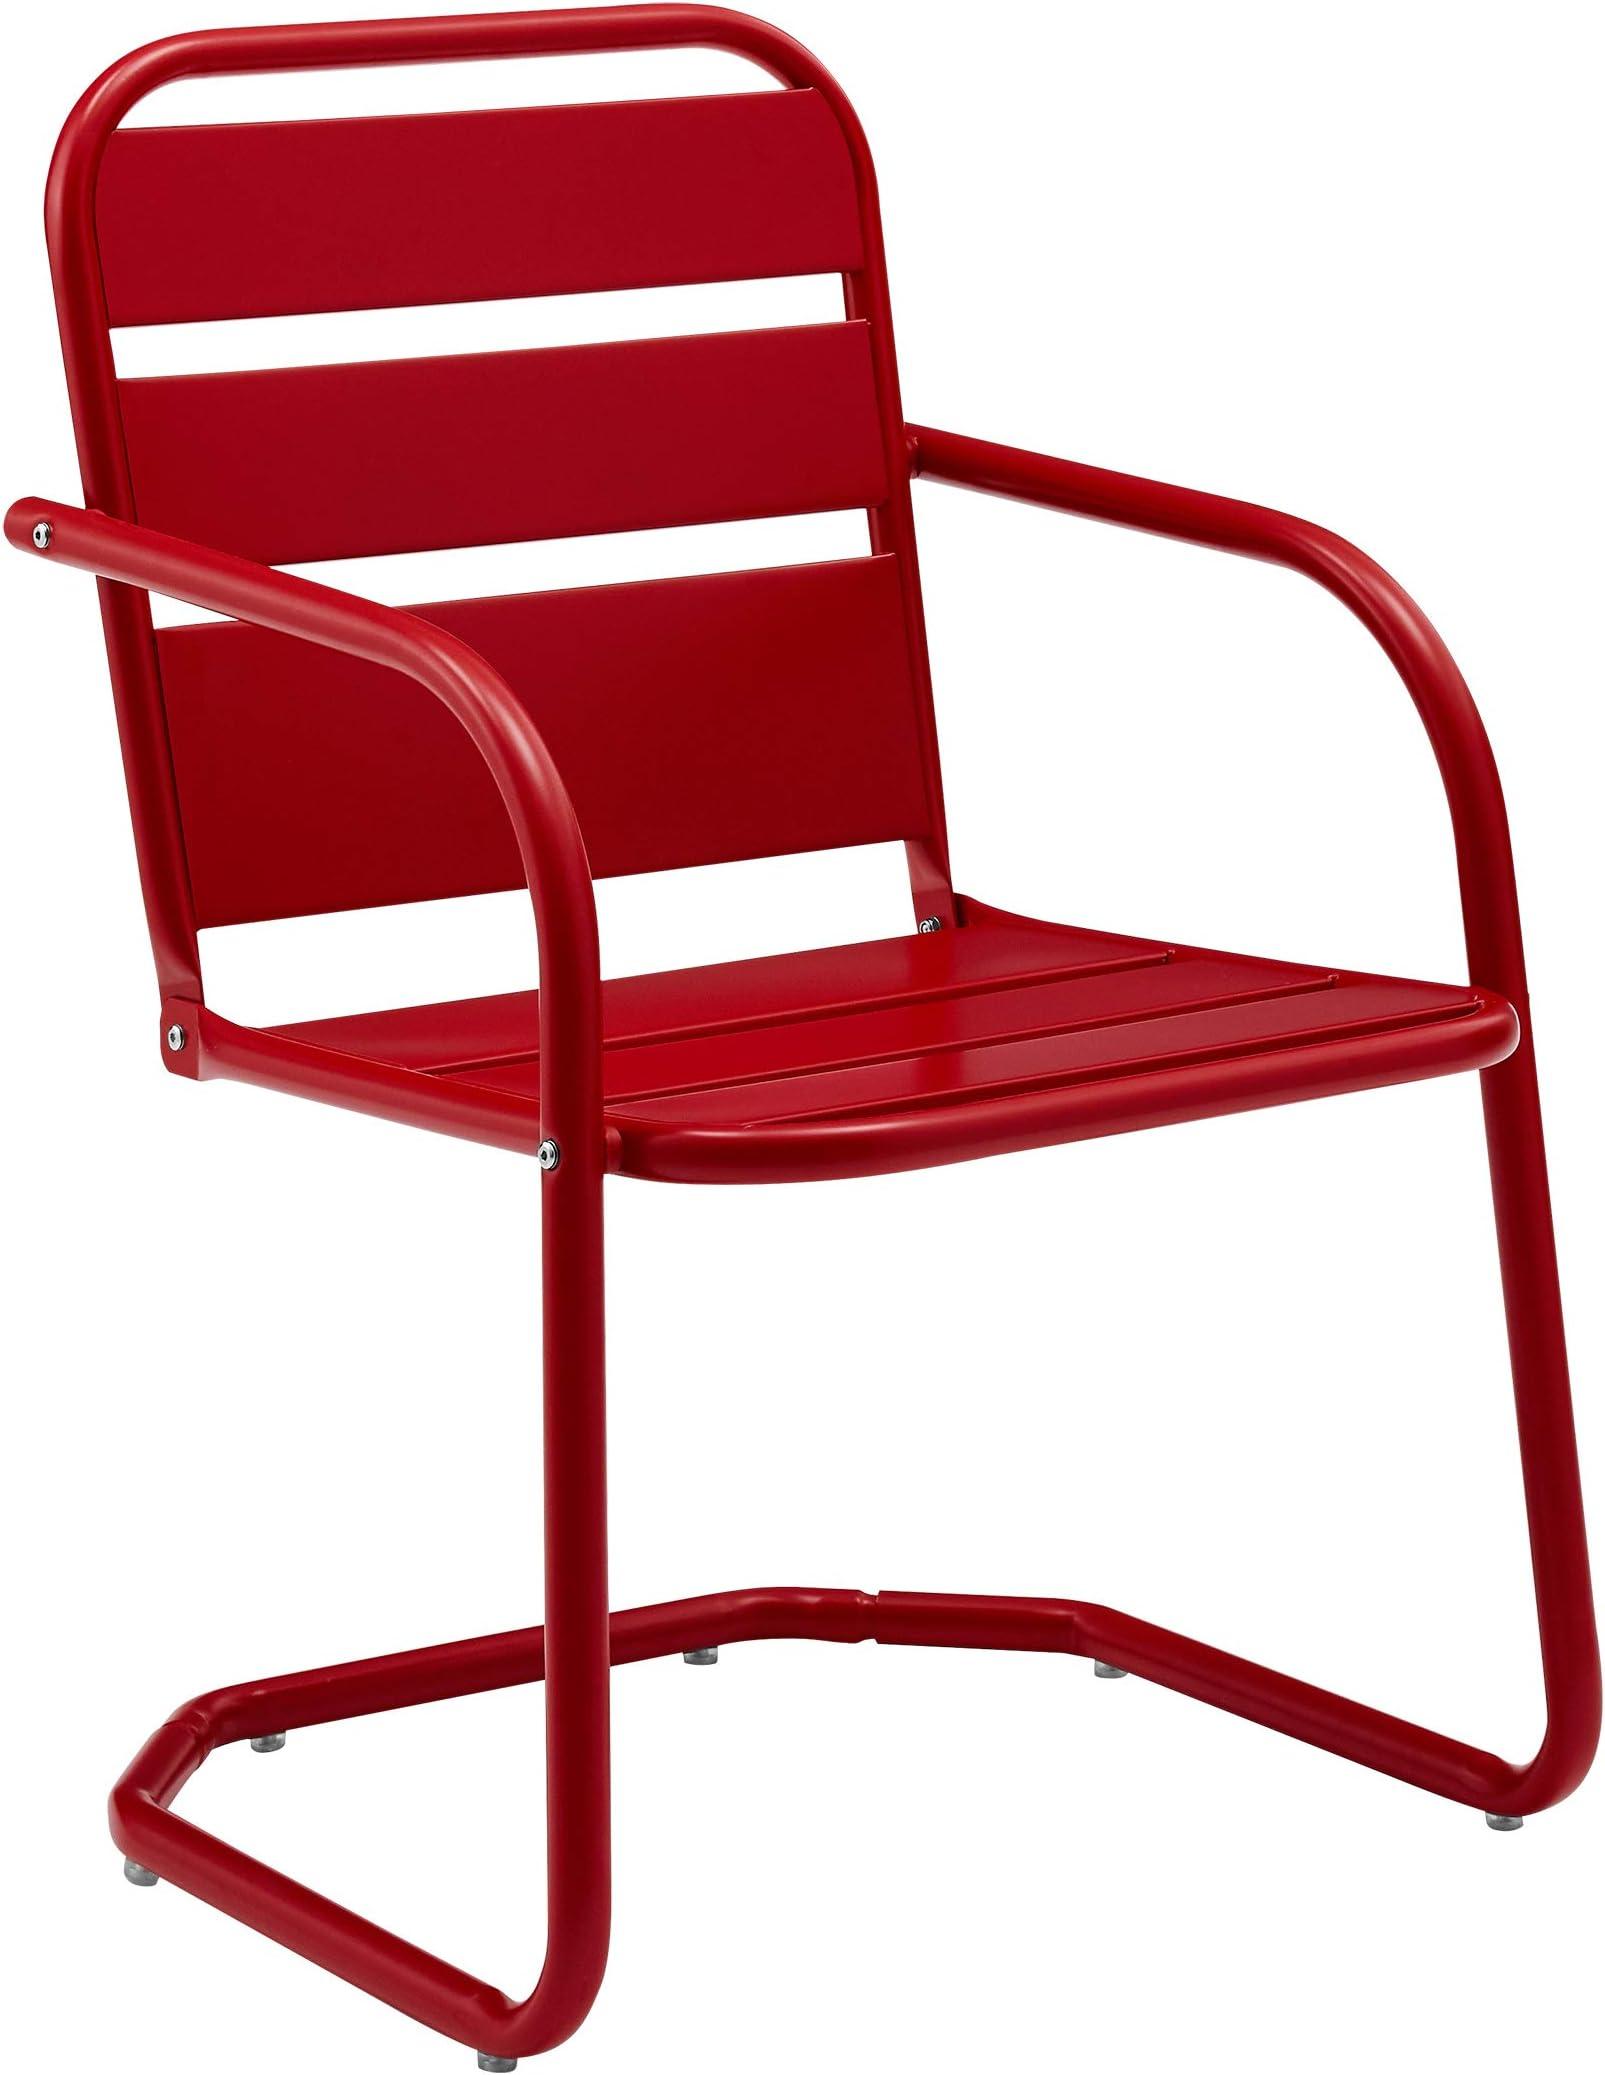 Crosley Furniture CO1030-RE Brighton Retro Metal Chair, Set of 2, Red